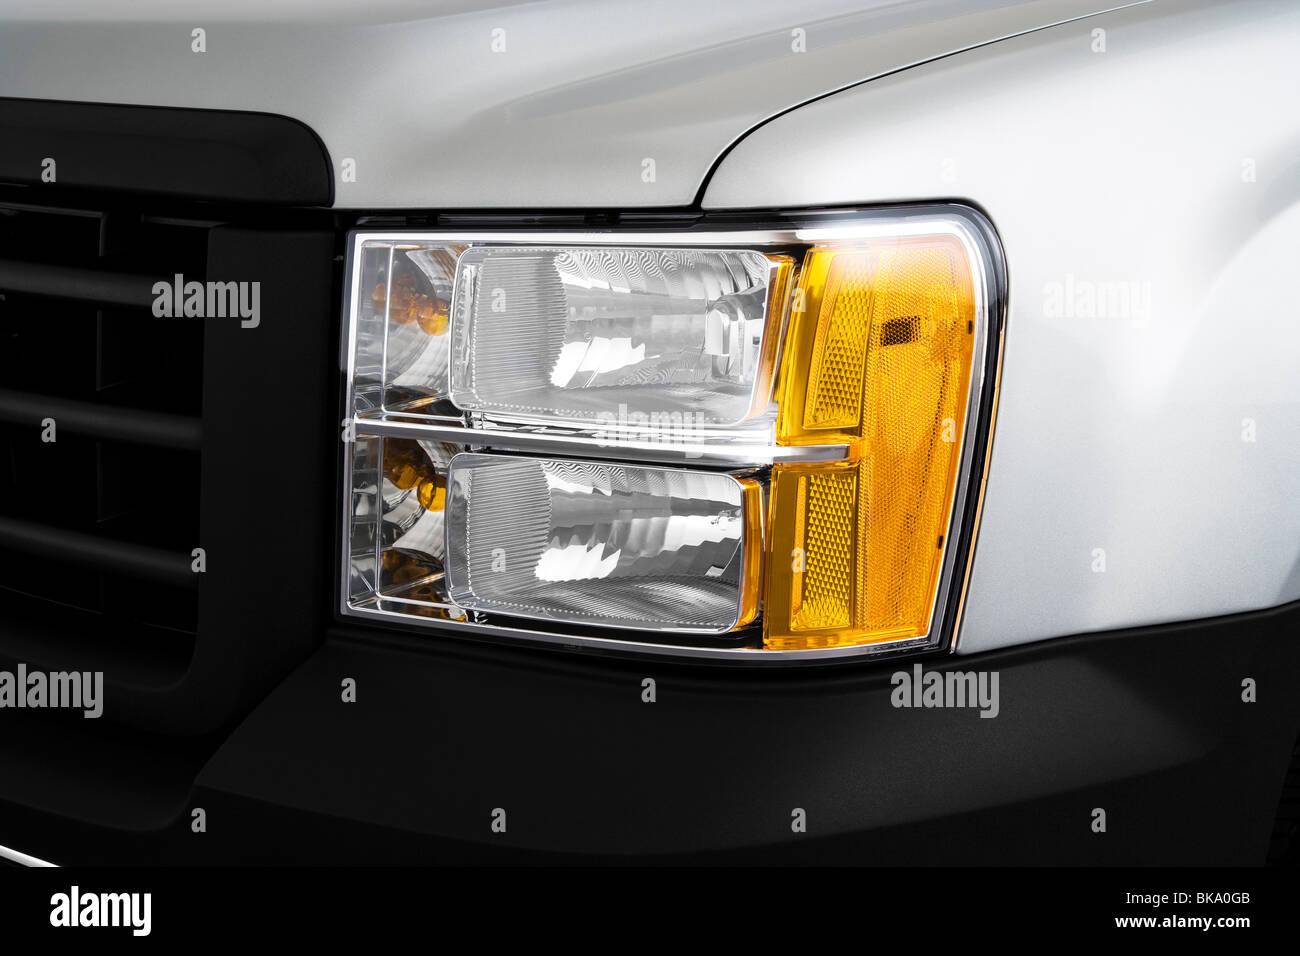 GMC Sierra 1500 WT pickup - Stock Image